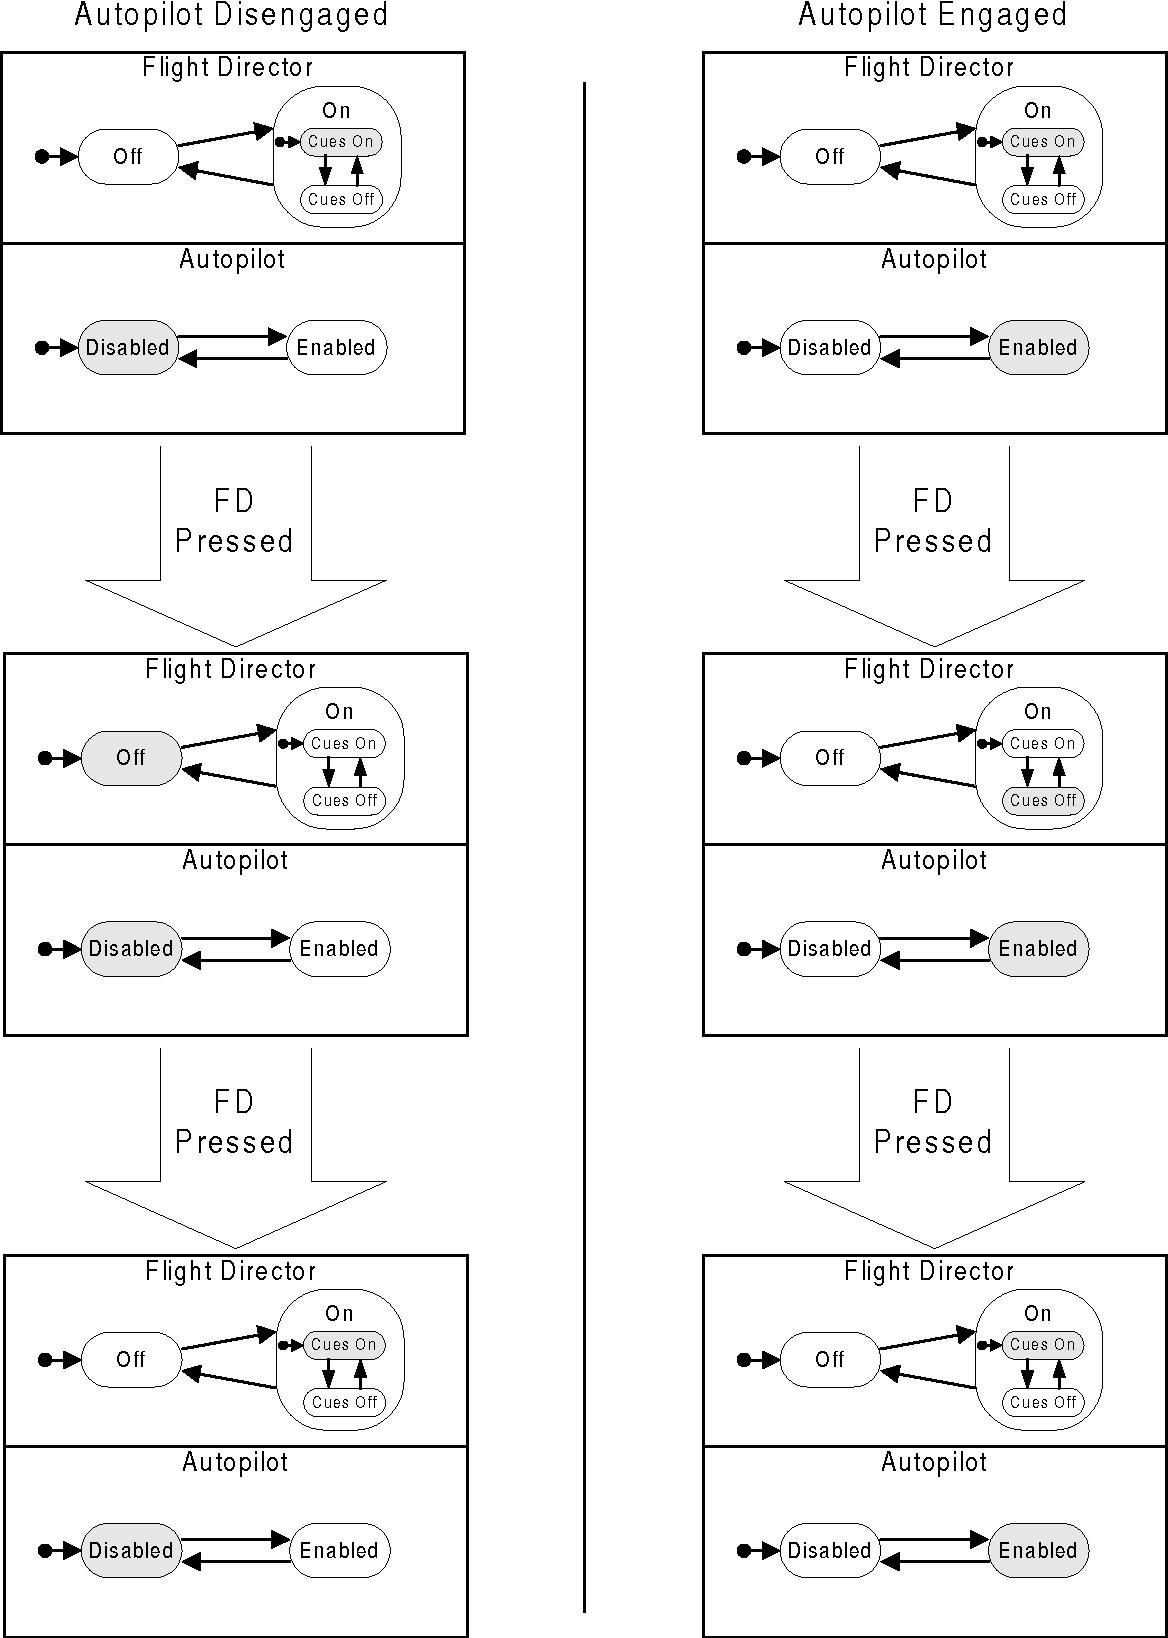 Figure 17 - Behavior of the FD Switch